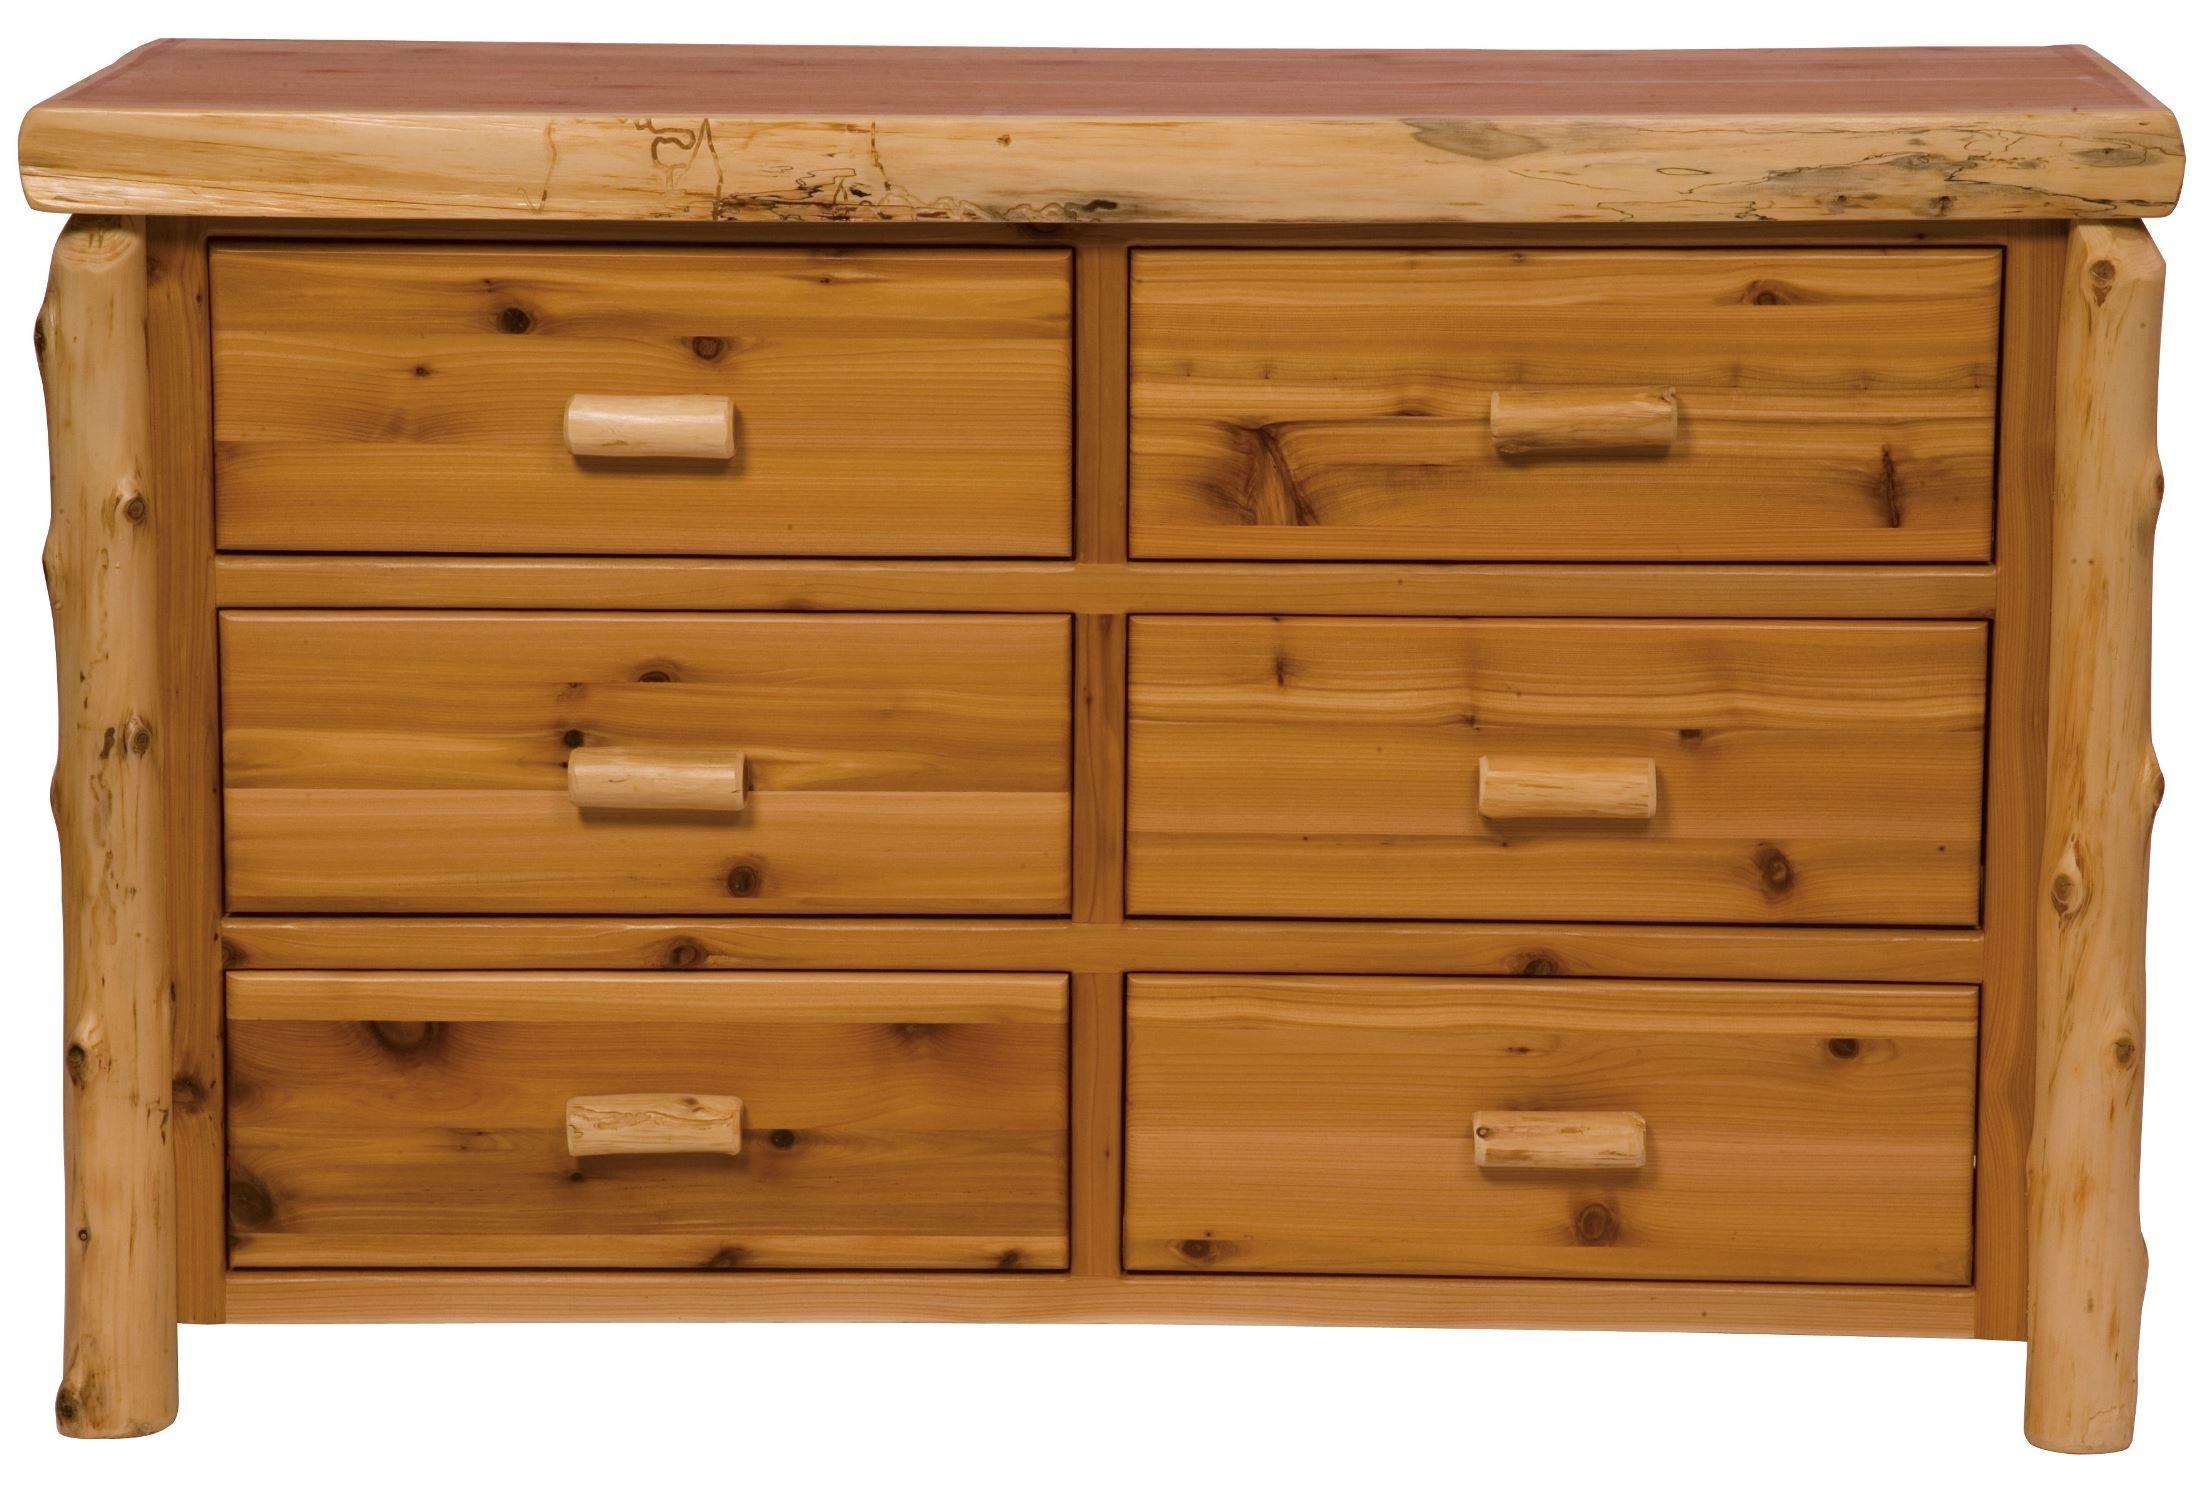 cedar bunk bedroom set from fireside lodge 10121 coleman furniture